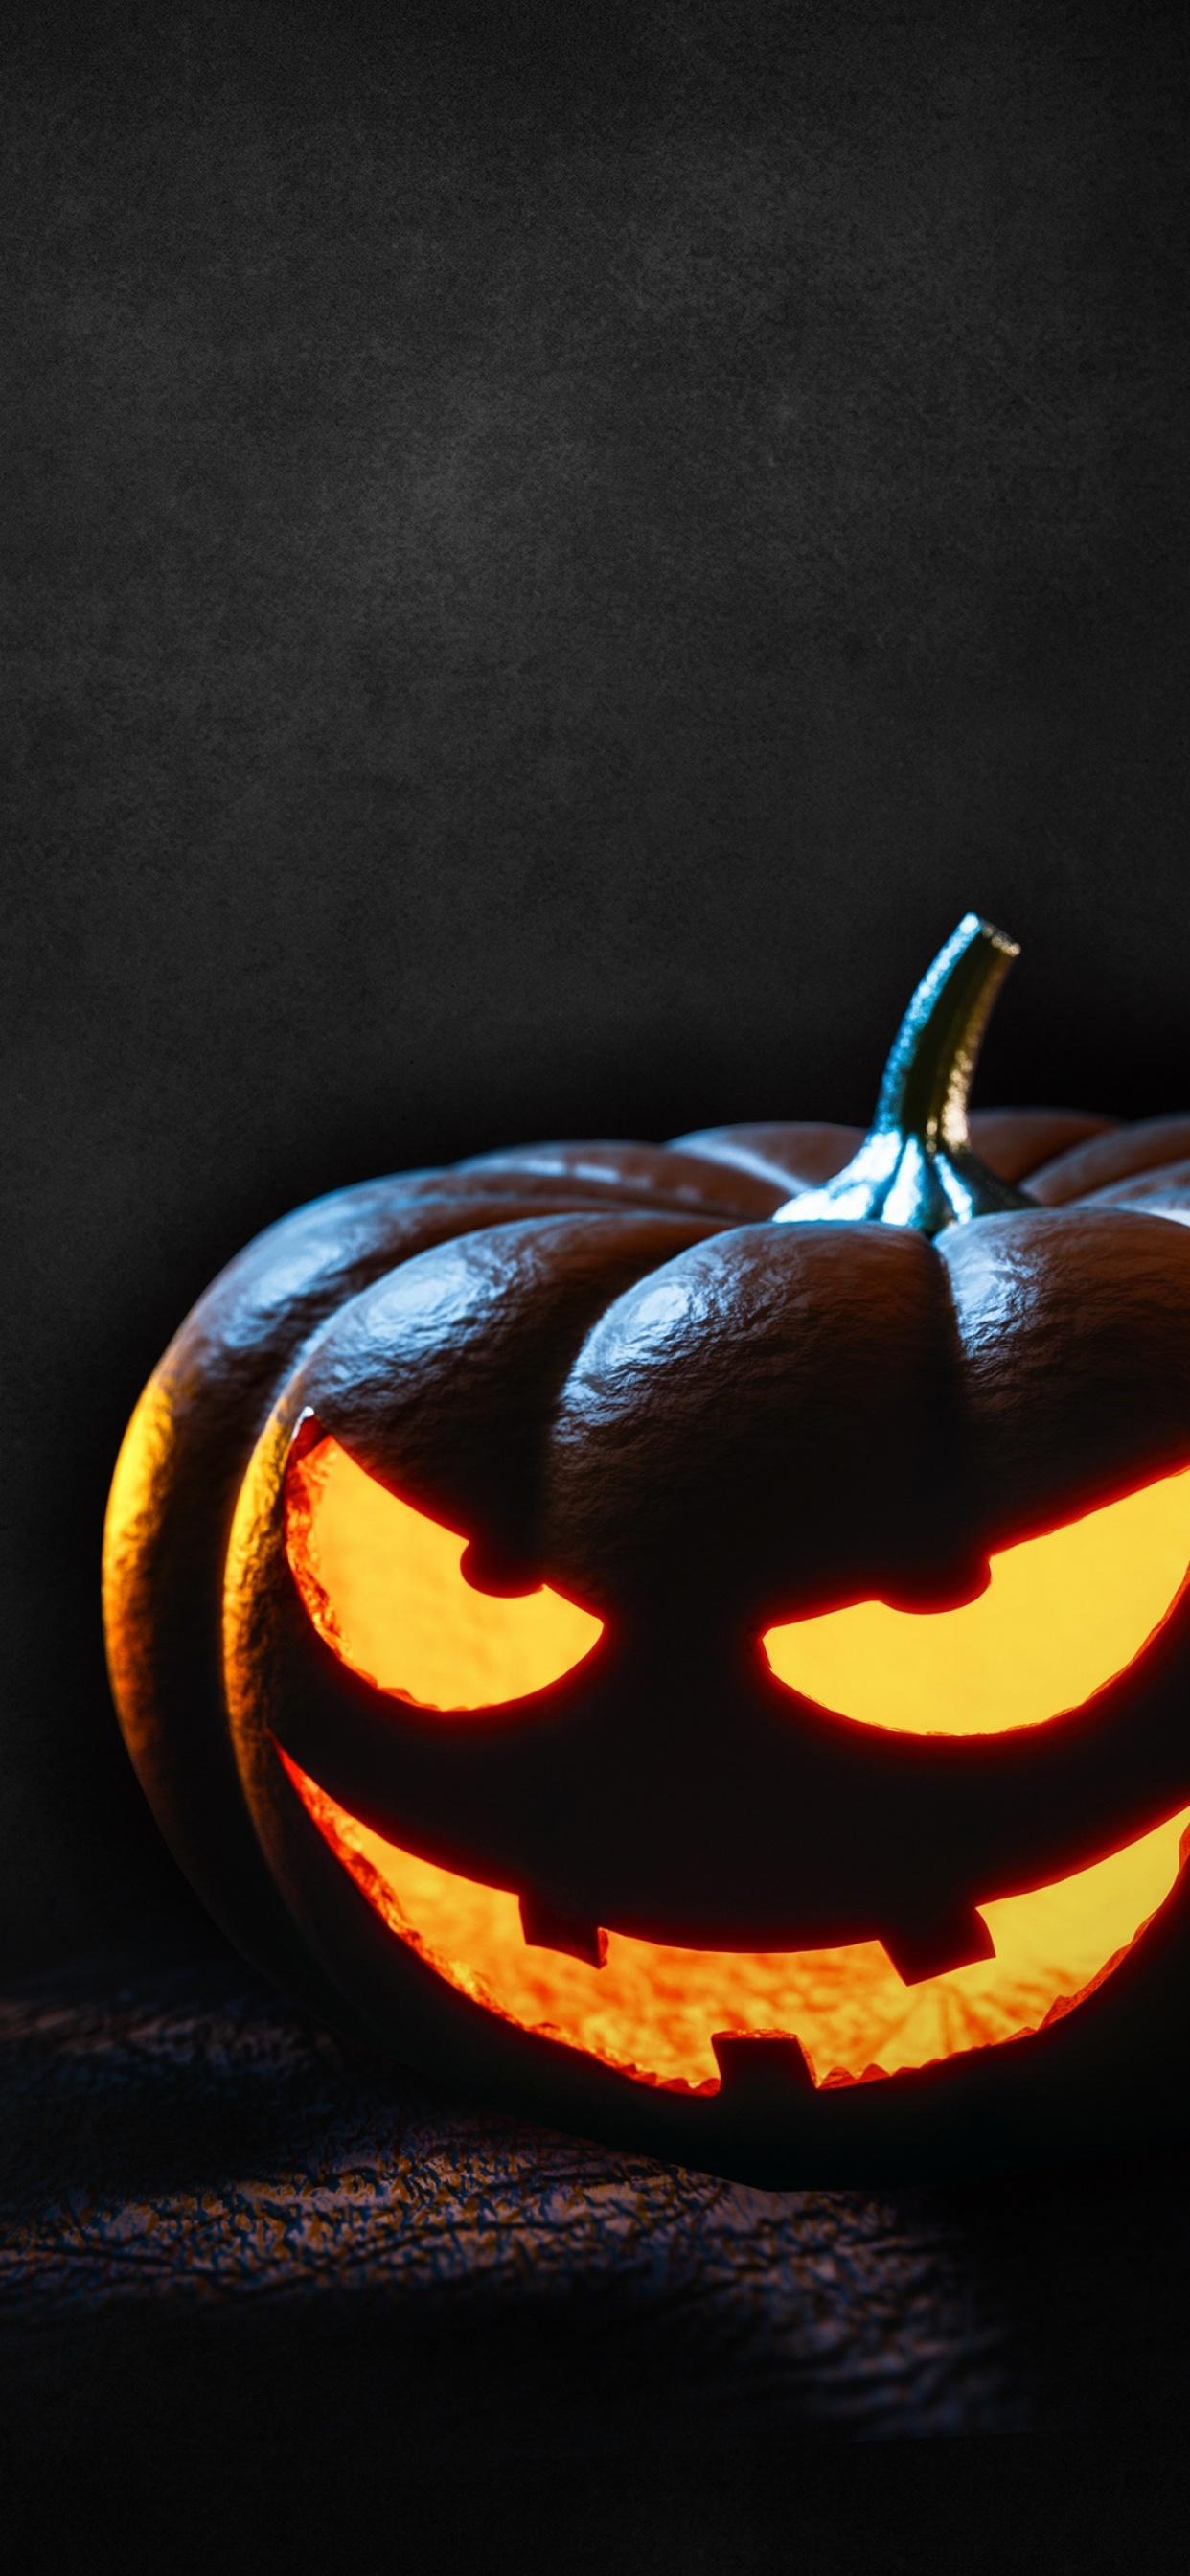 halloween pumpkin scary glowing wallpapers dark celebrations 4k